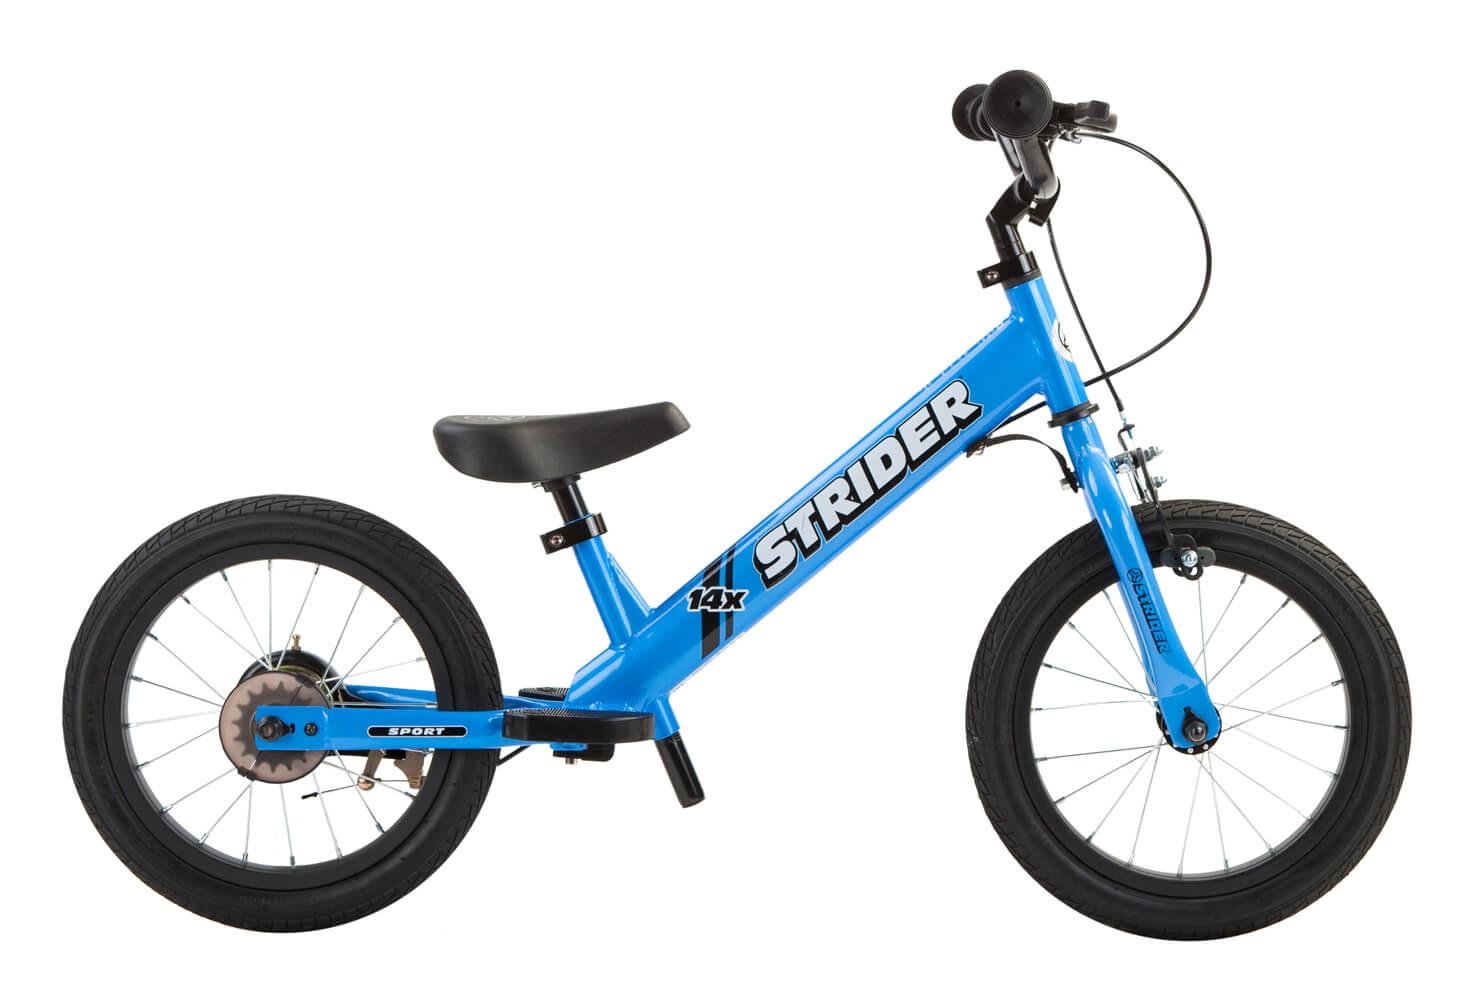 Strider 14x Balance Bike